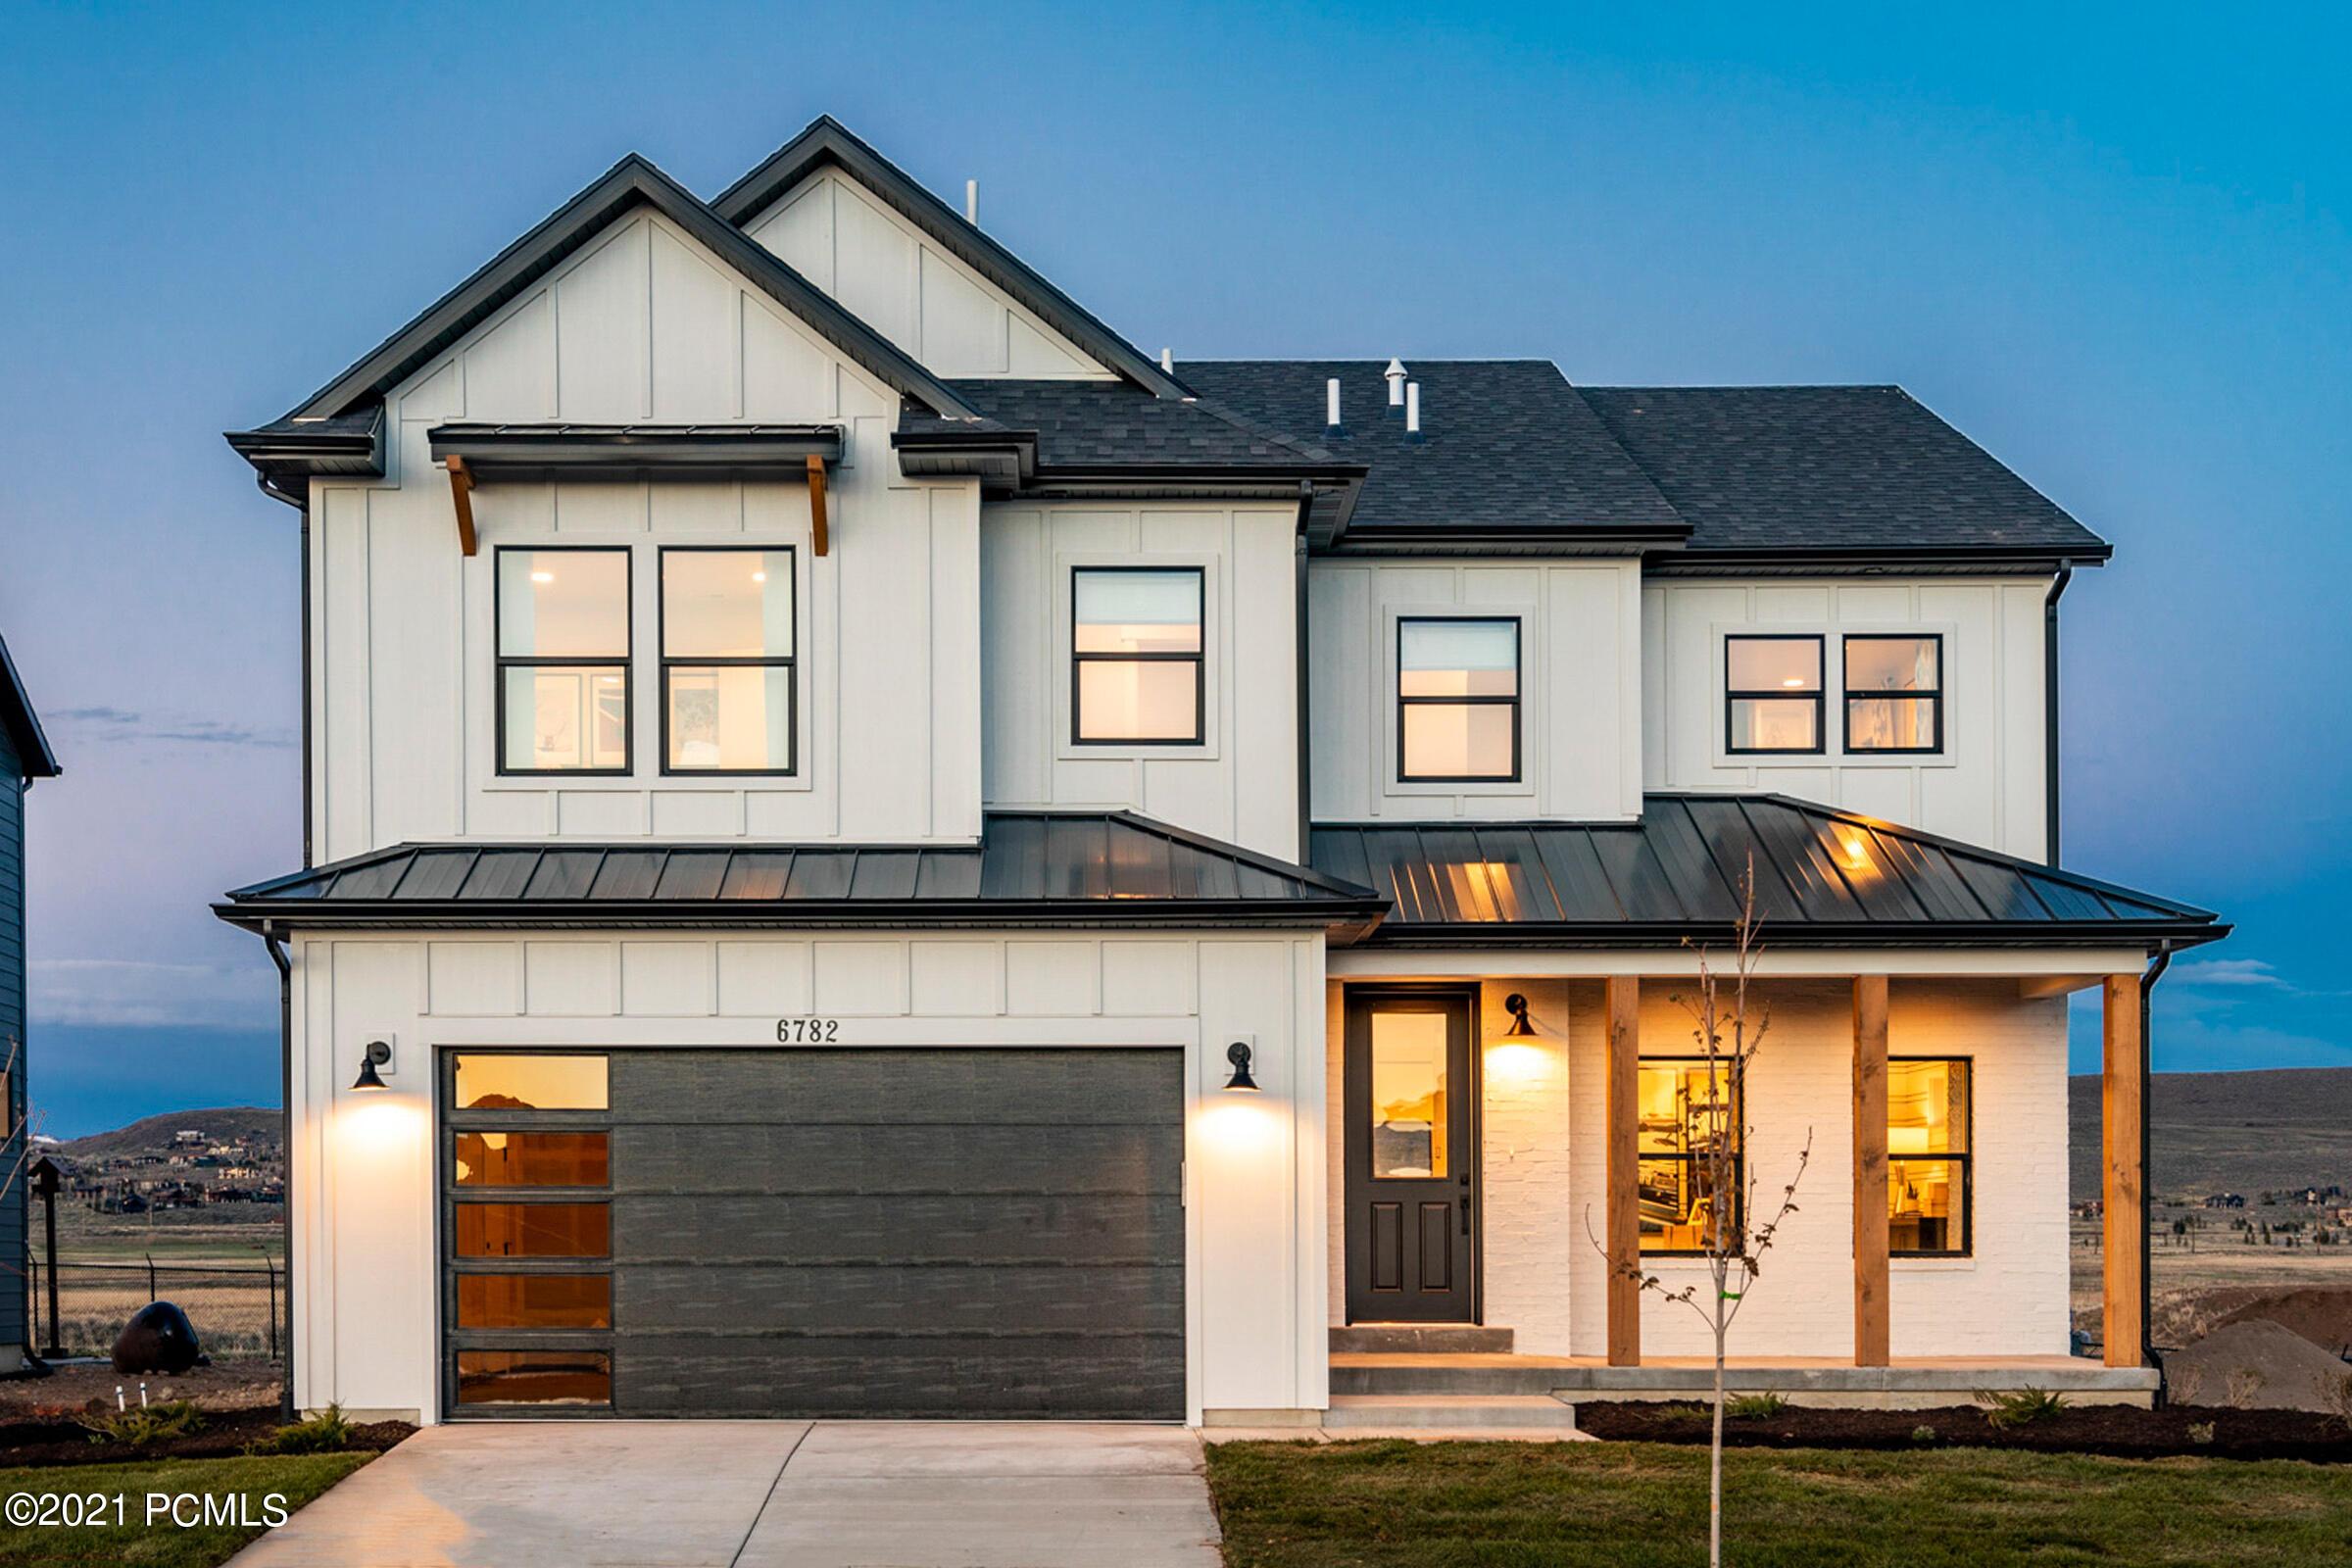 6782 Woods Rose Drive, Park City, Utah 84098, 5 Bedrooms Bedrooms, ,4 BathroomsBathrooms,Single Family,For Sale,Woods Rose,12102471